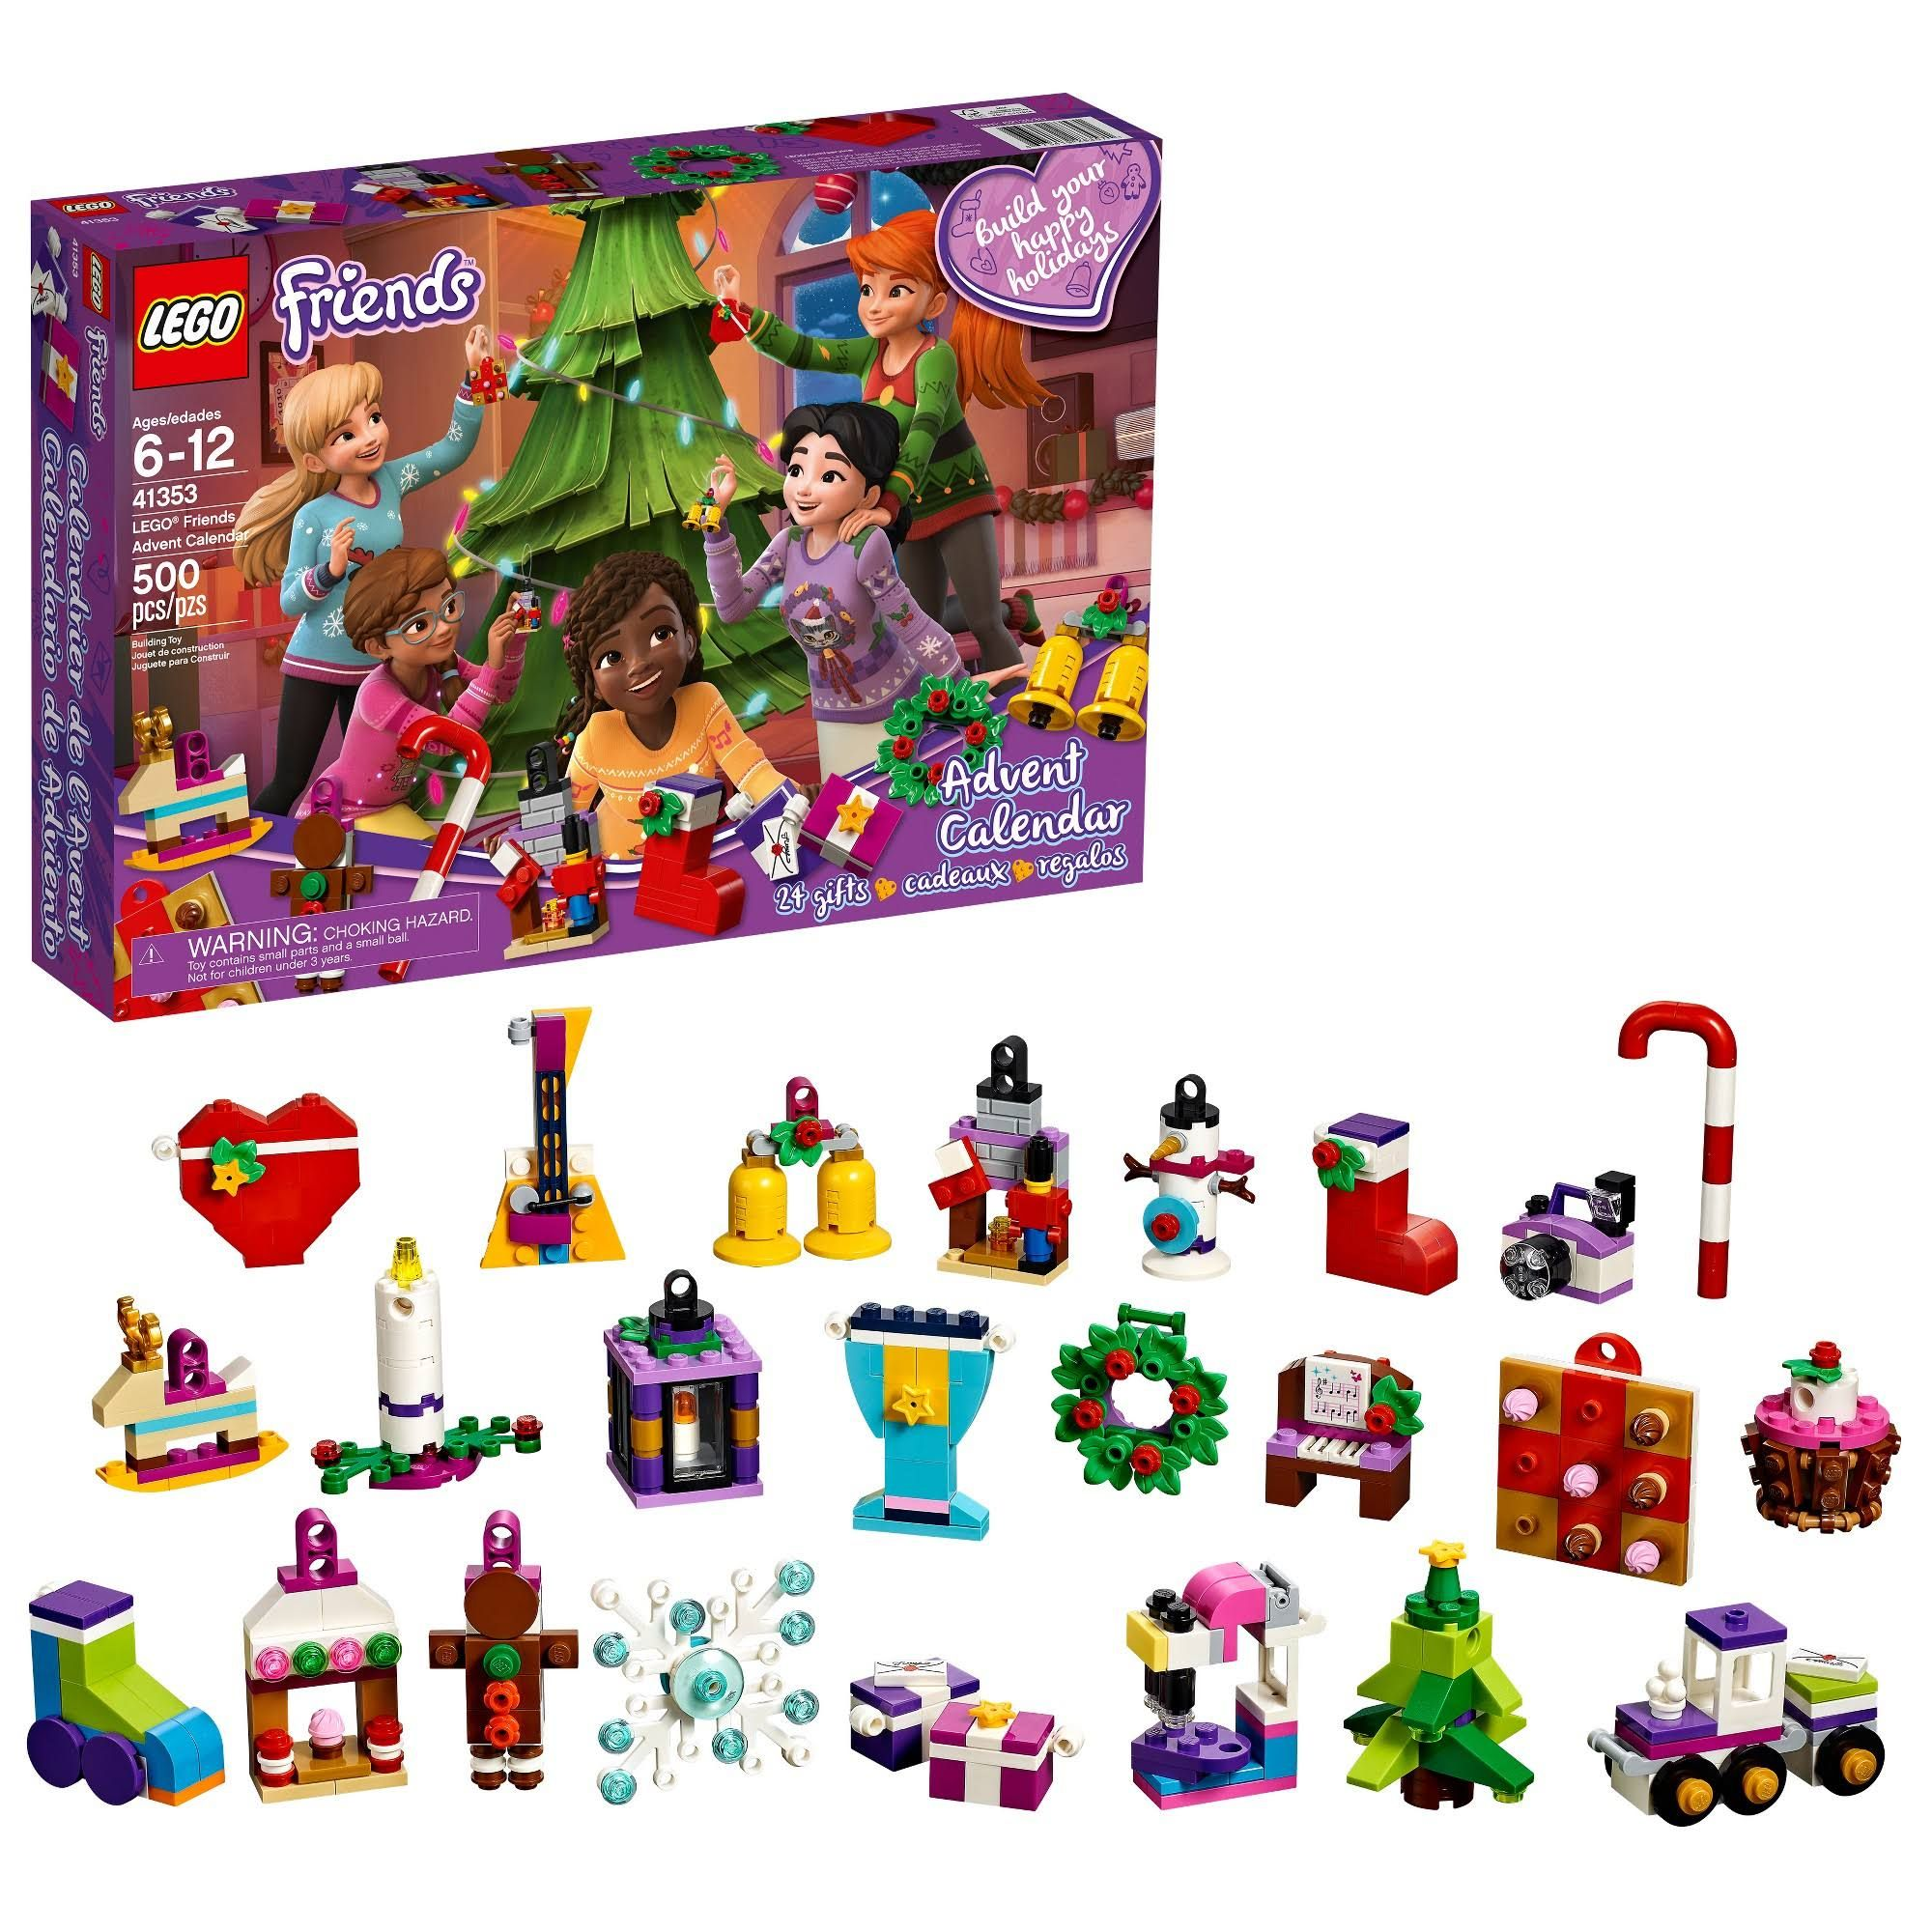 Lego Friends 2018 Advent Calendar Google Search In 2020 Kids Calendar Christmas Countdown Calendar Lego Friends